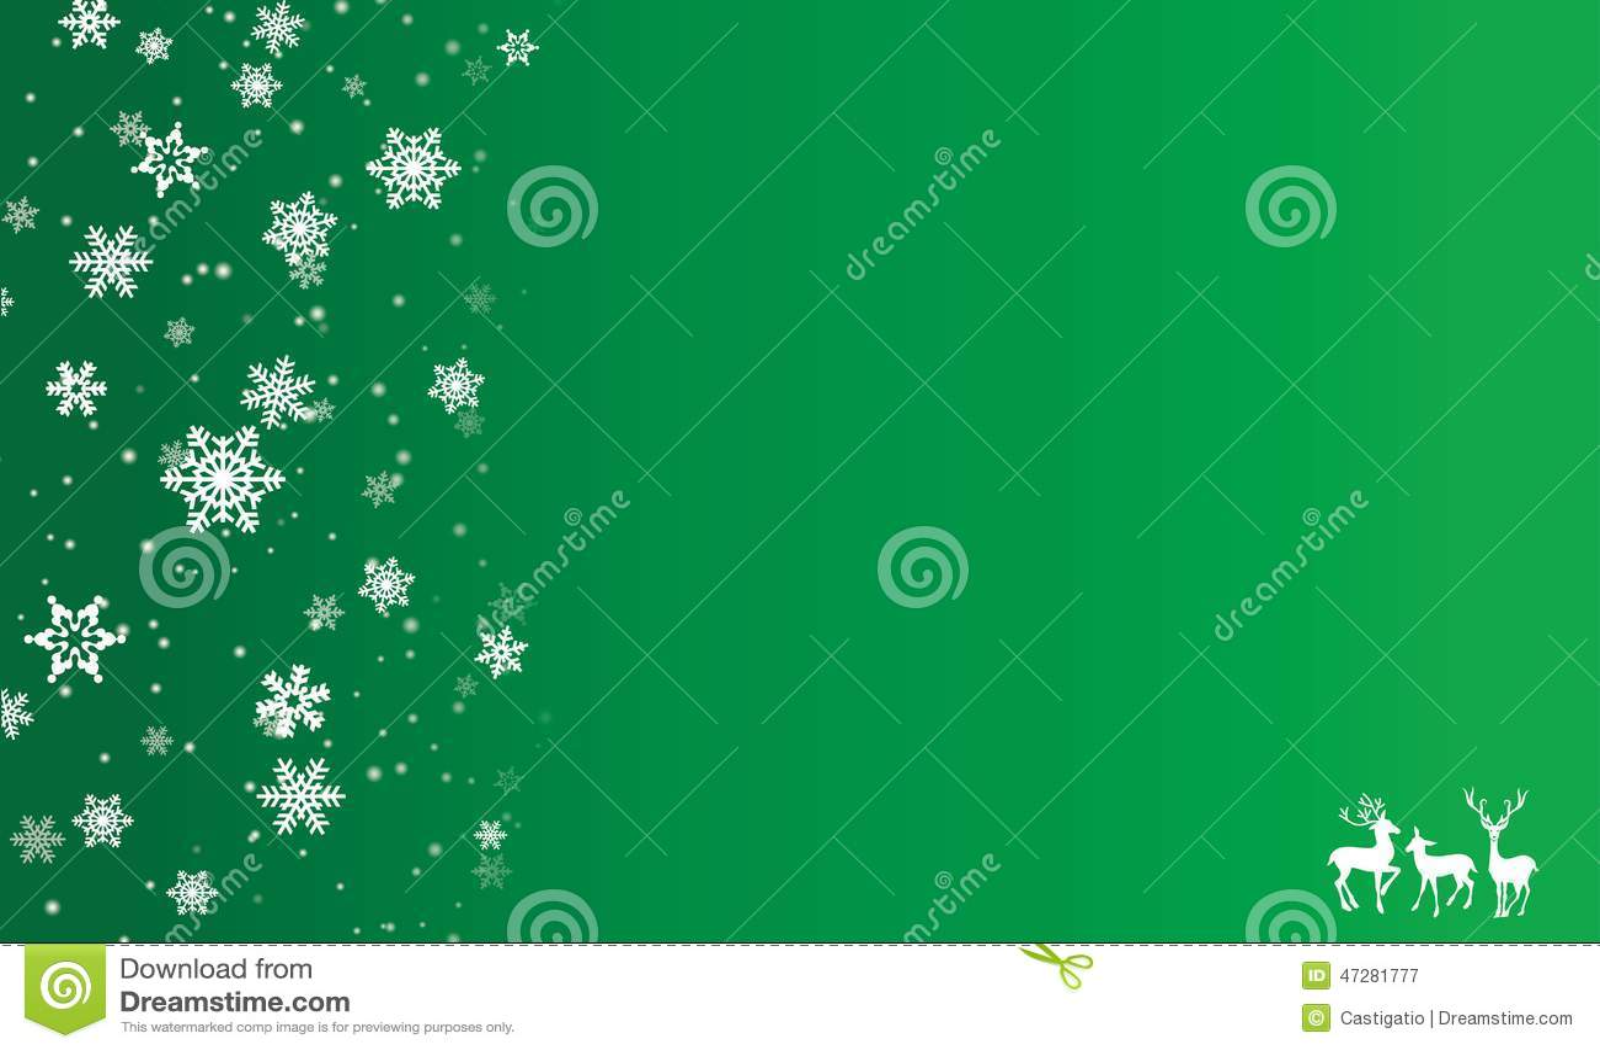 Christmas Wallpaper Snow Falling Merry Christmas Invitation Postcard Background Winter